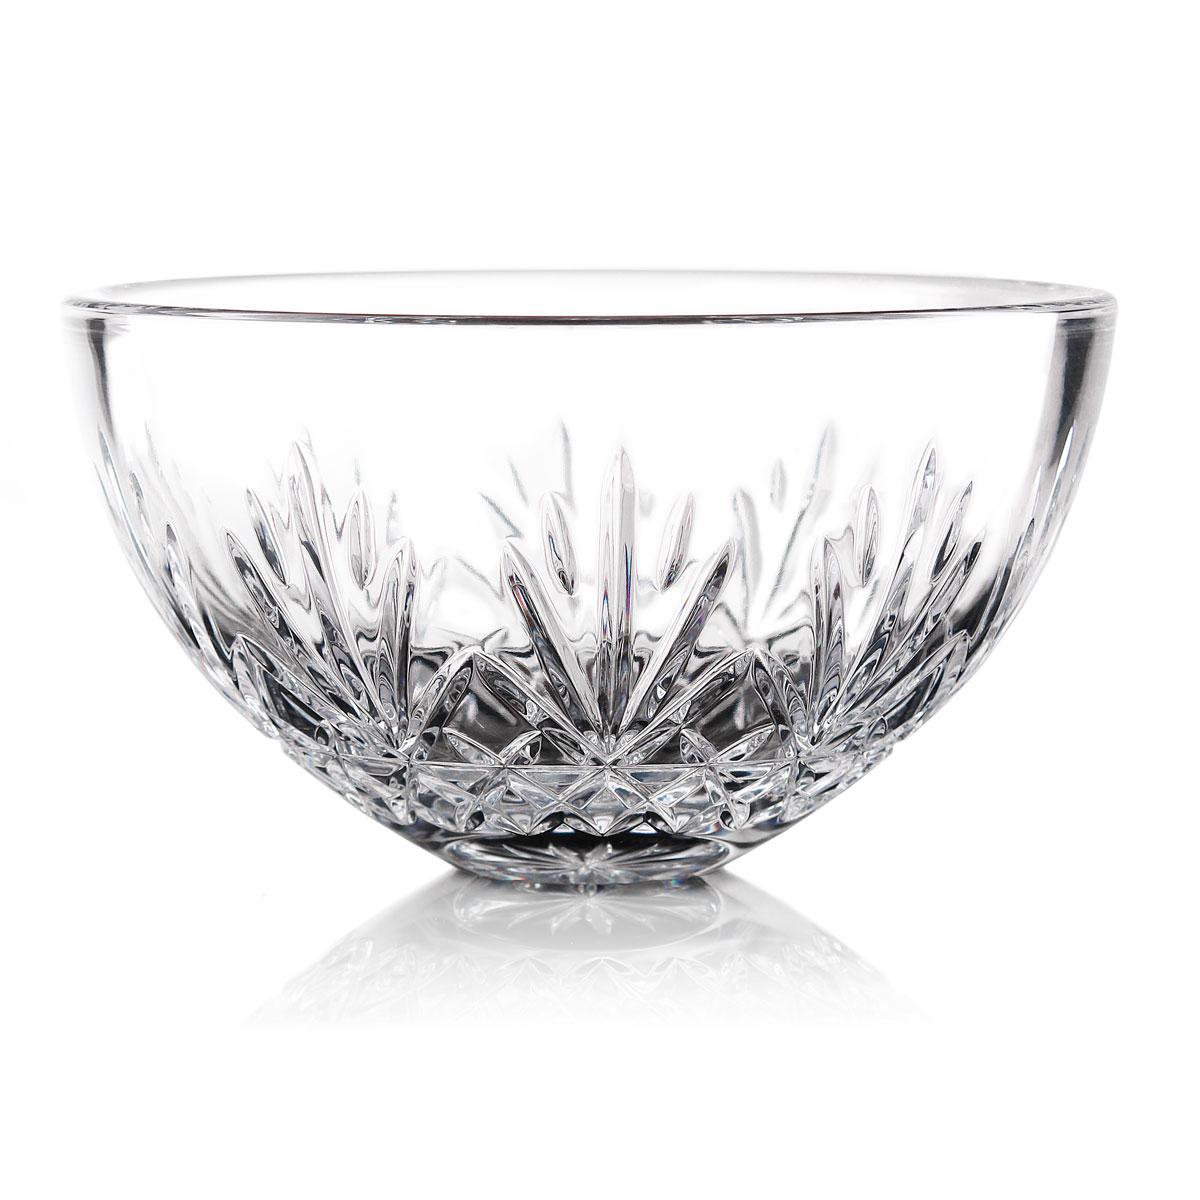 "Cashs Ireland, Annestown 10"" Crystal Bowl"